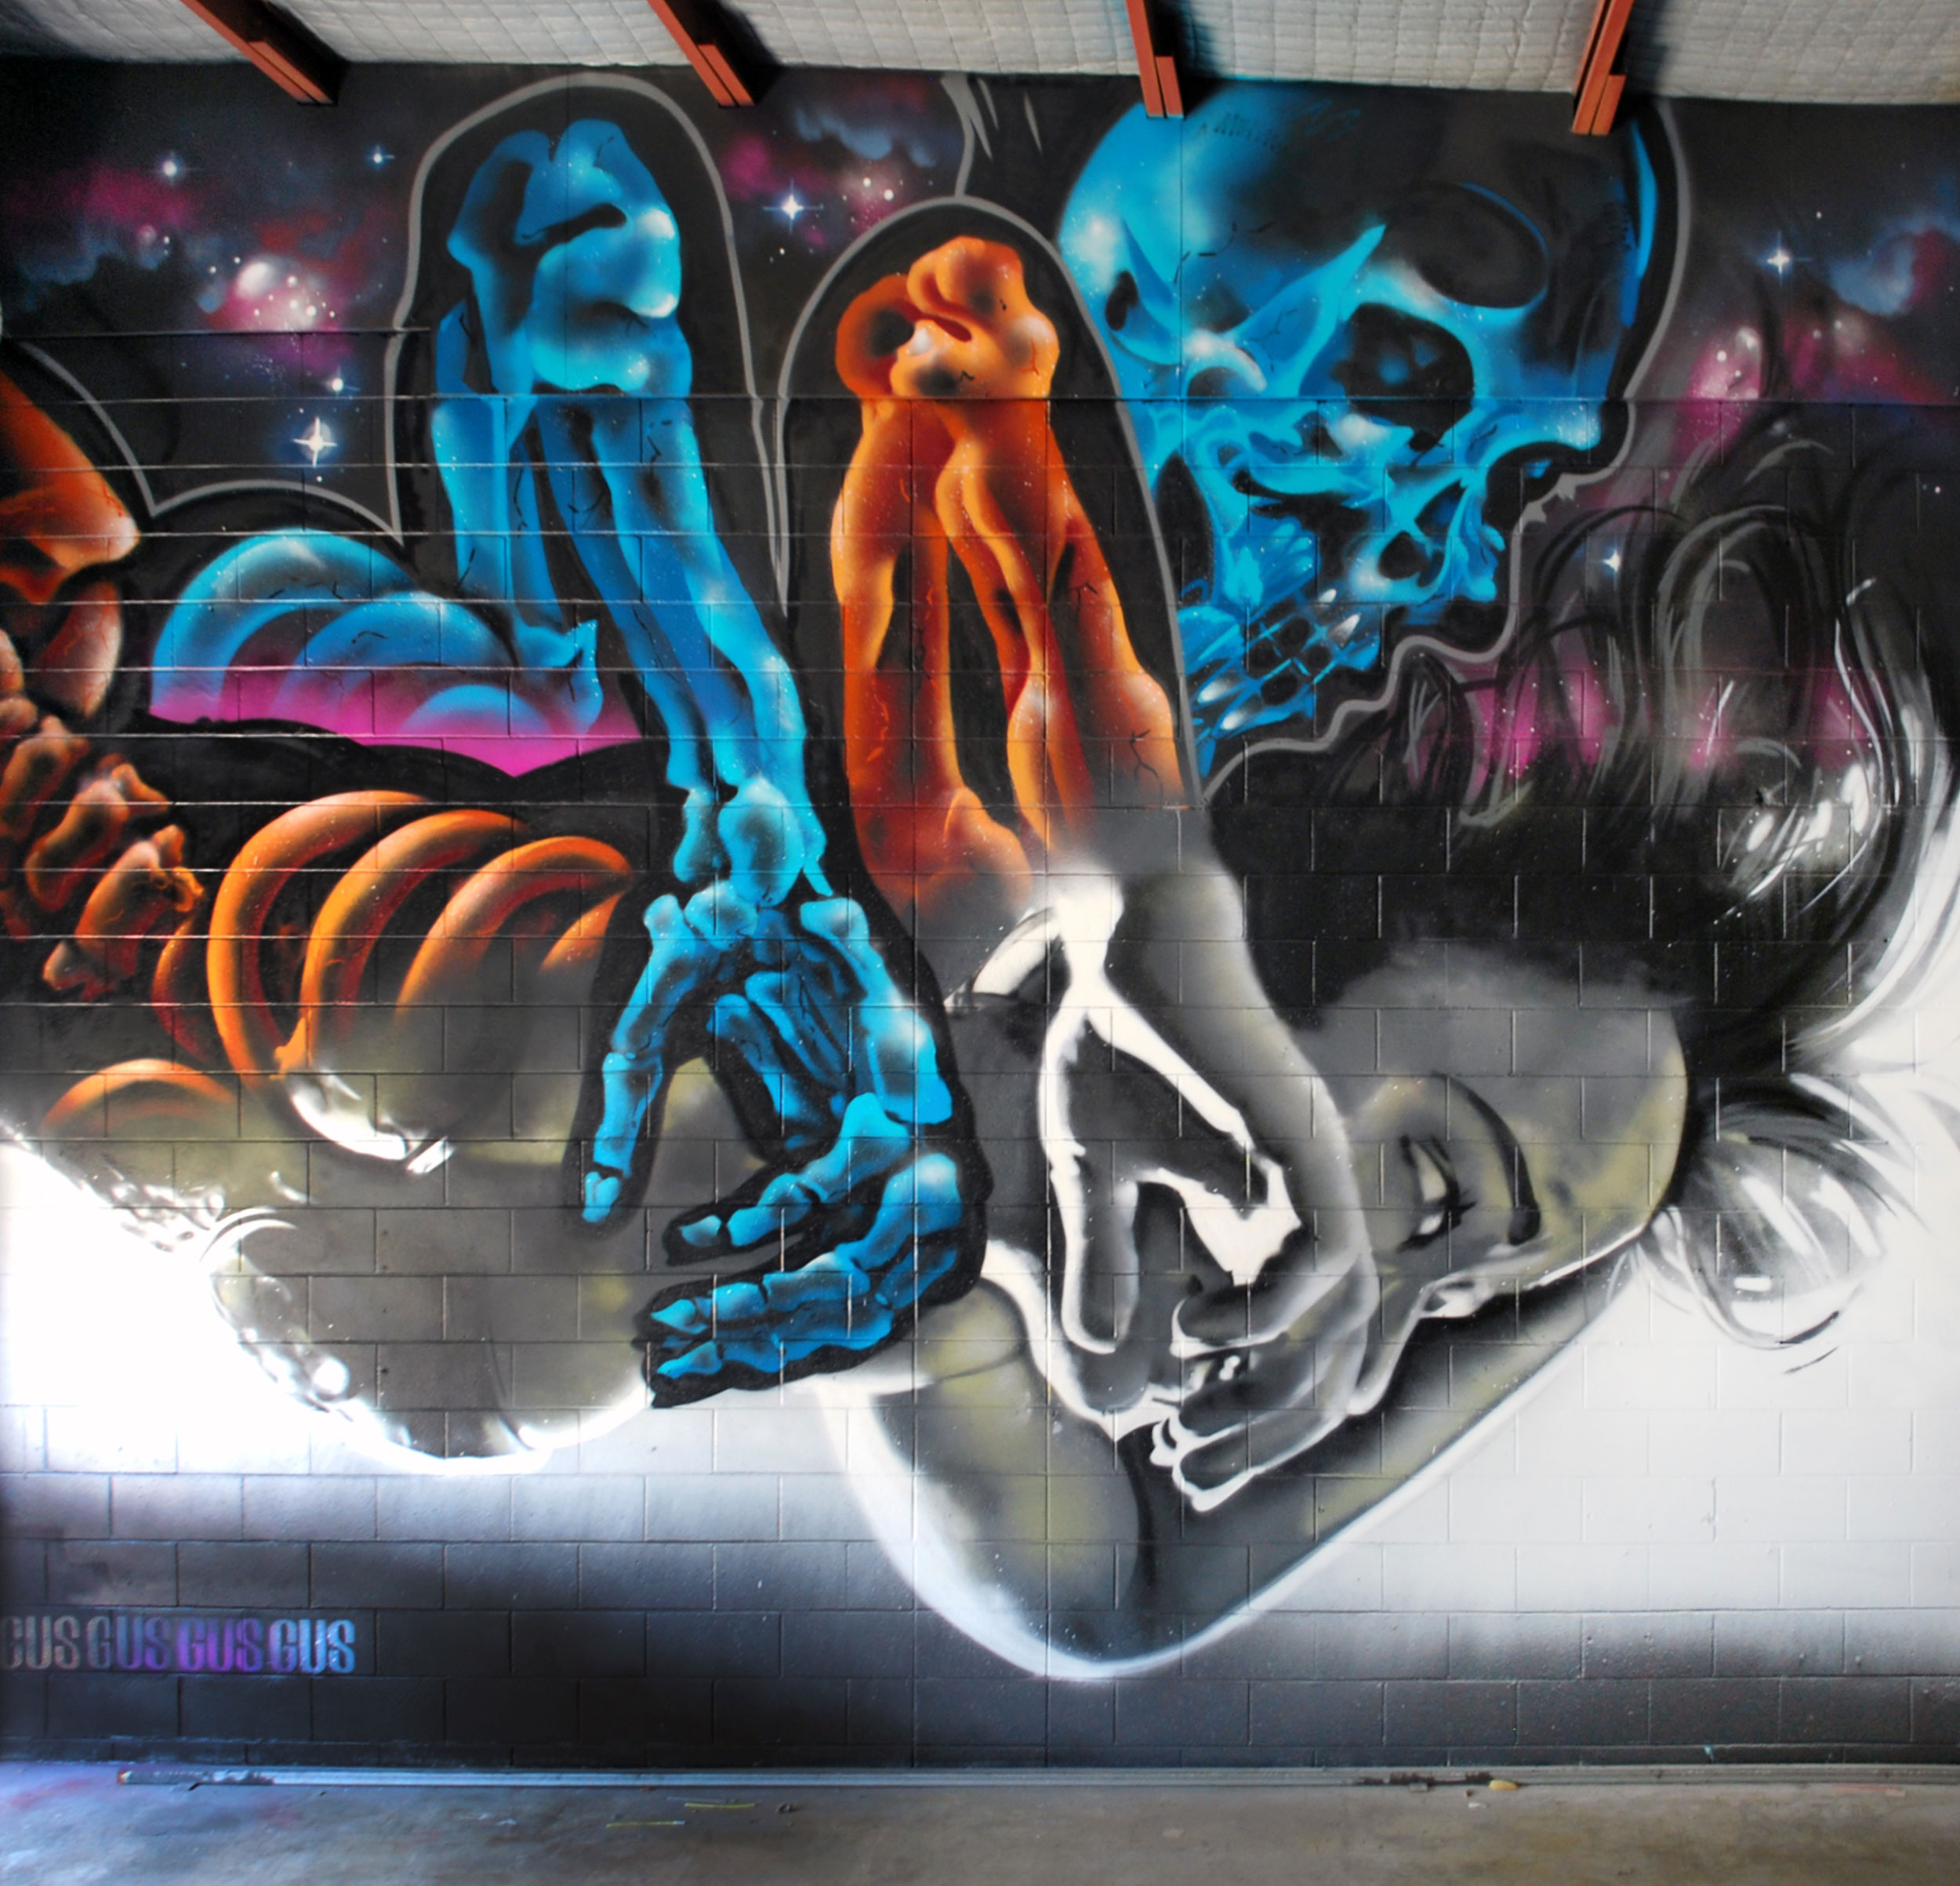 gus-eagleton-2014-found-art-space-brisbane.jpg